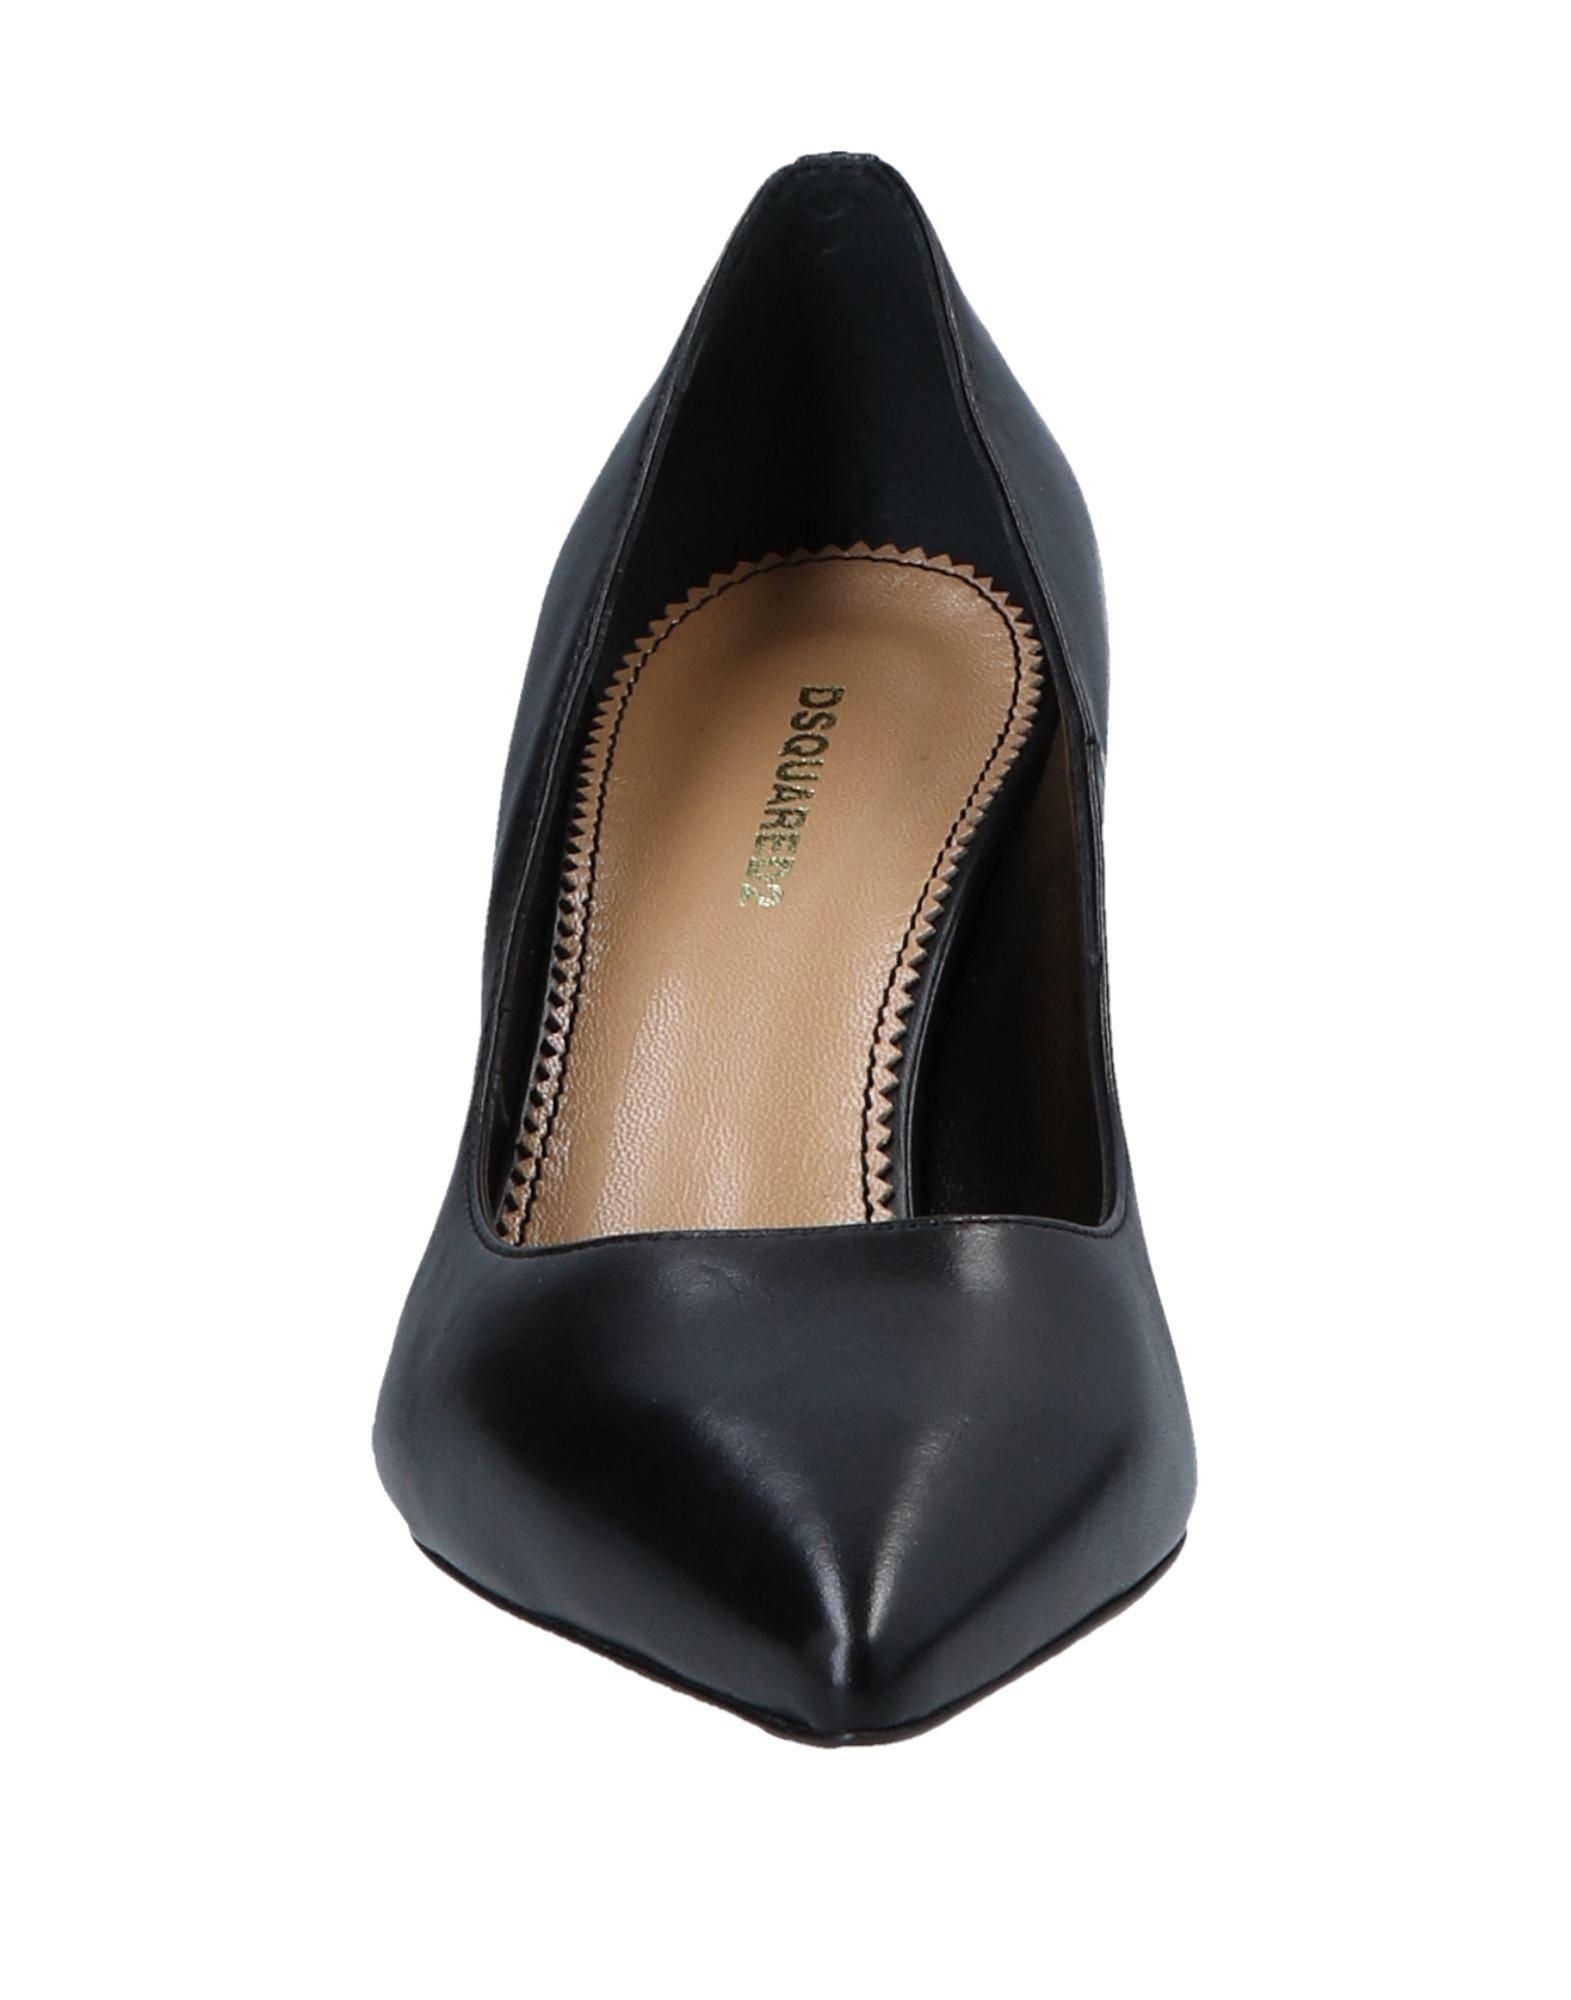 Dsquared2 Pumps Damen gut  11255075FXGünstige gut Damen aussehende Schuhe 2cc4cf